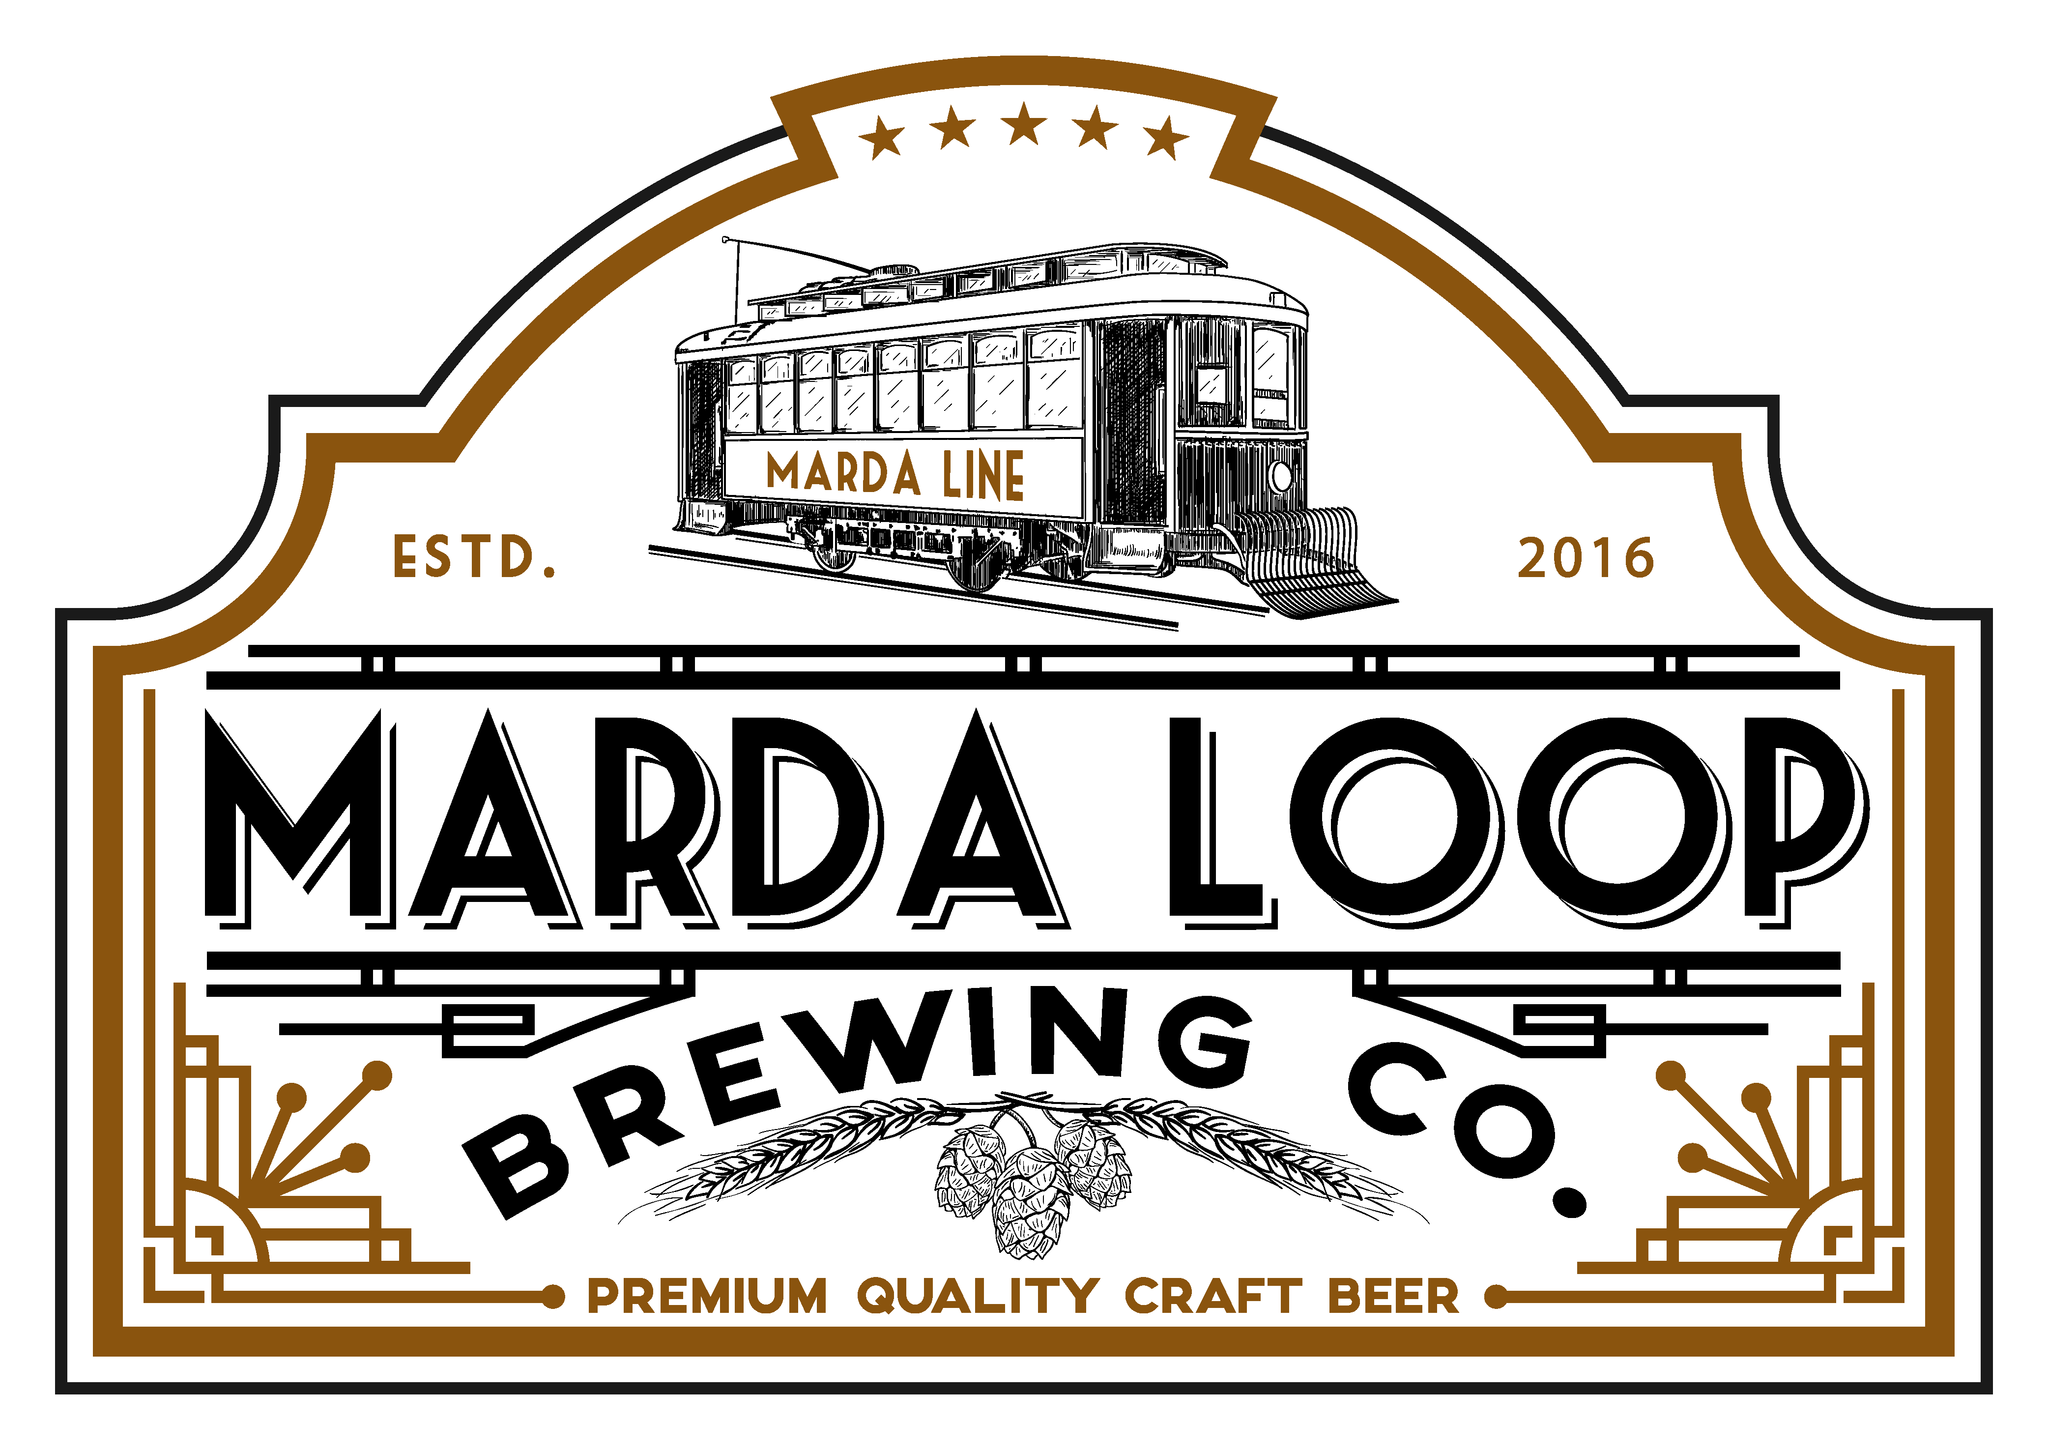 Marda Loop PNG (Transparent background)-01.png